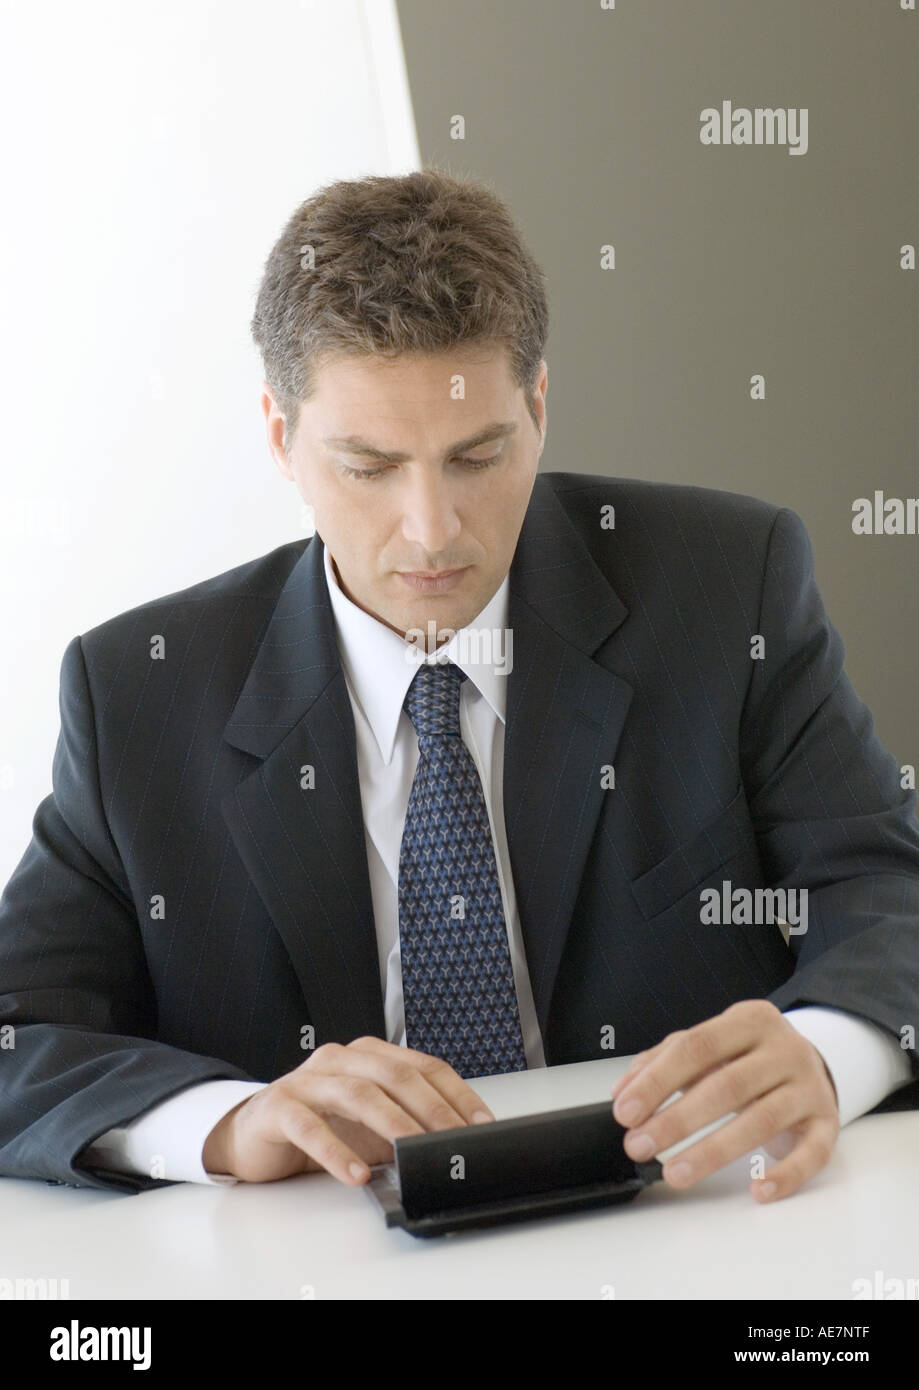 Businessman using pocket computer - Stock Image